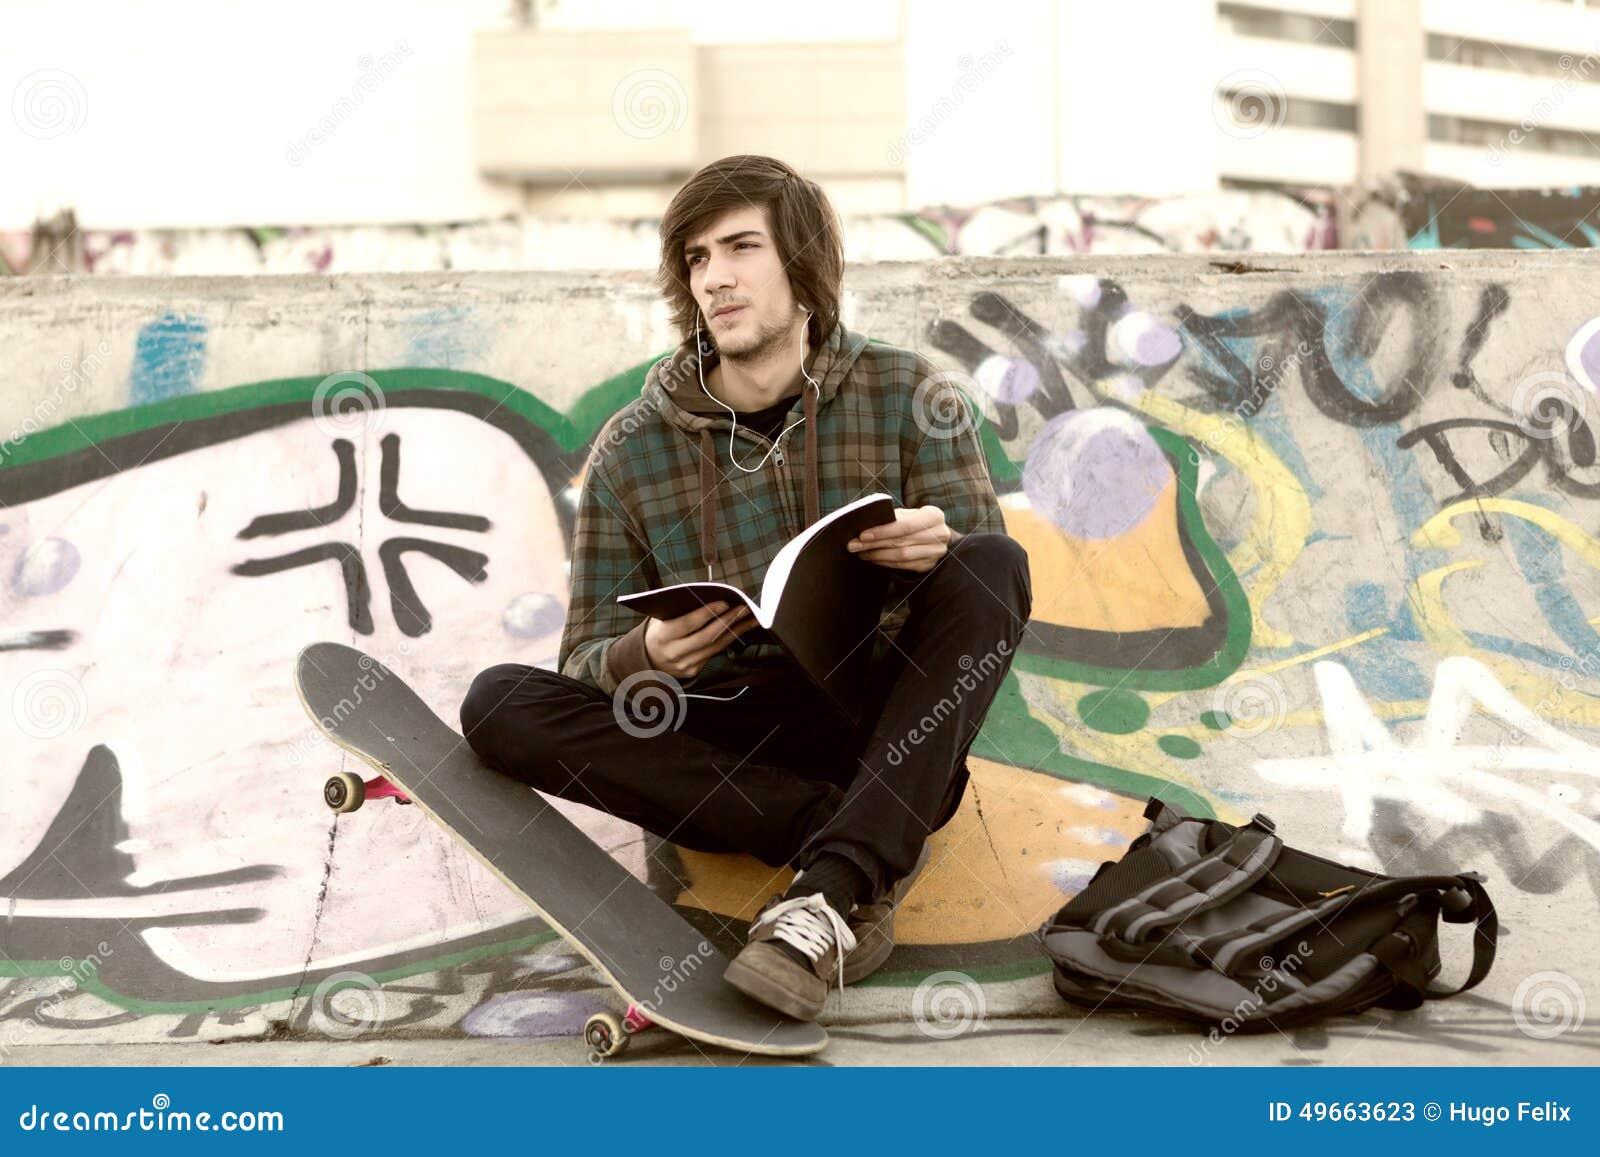 Skateboradåkare